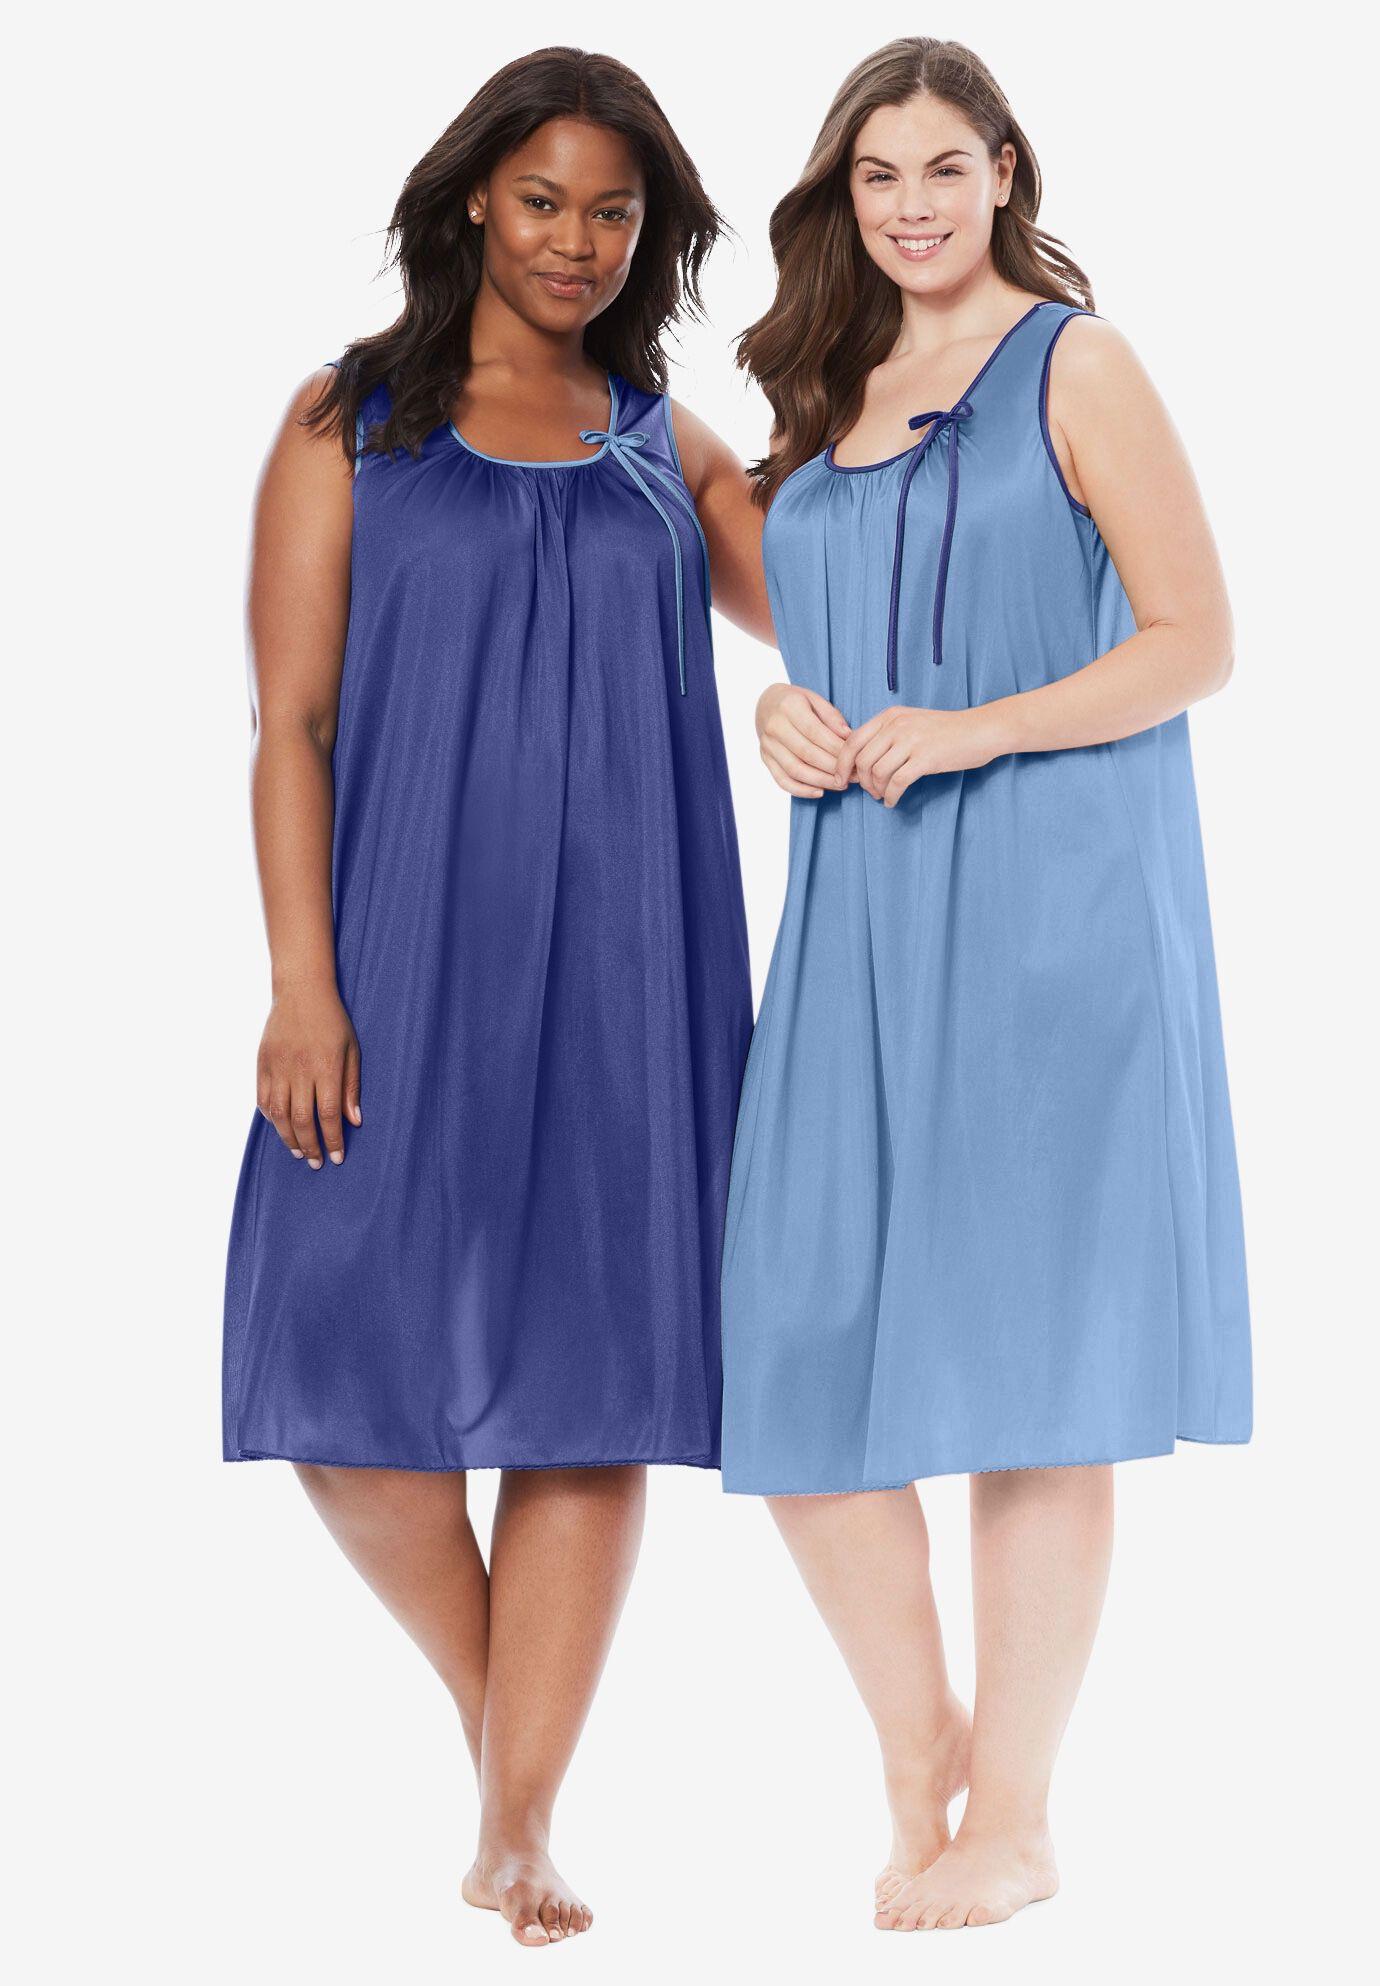 Ladies Plain Teal Turquoise Satin Chemise Nightie Nightdress PLUS SIZE 10-34!